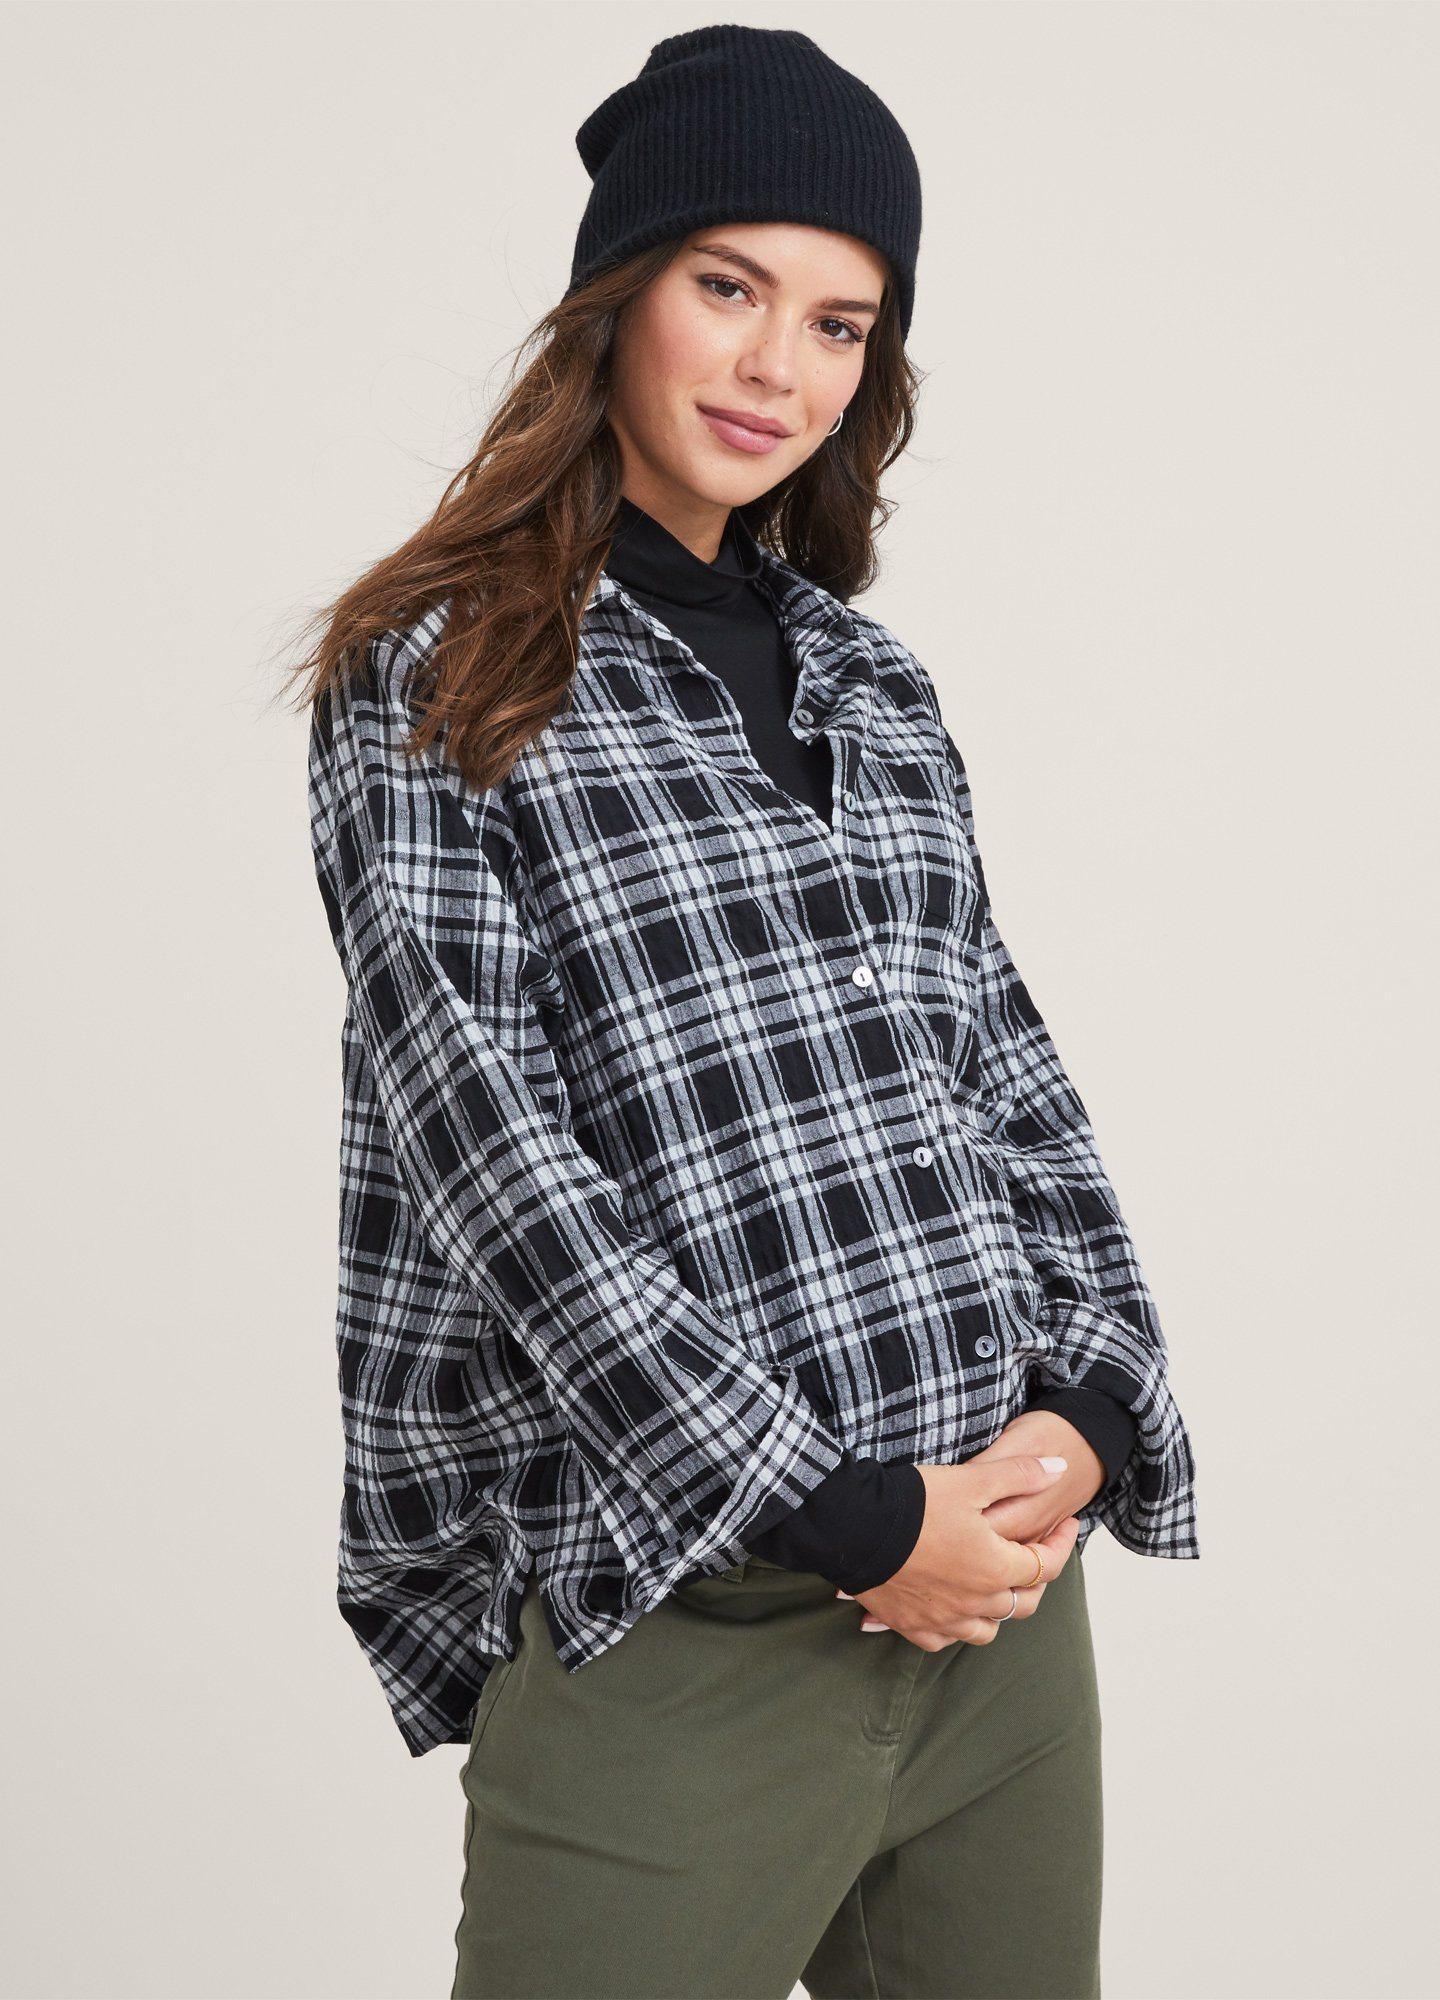 HATCH Maternity The Boyfriend Shirt, black/ivory Crinkle Plaid, Size 1